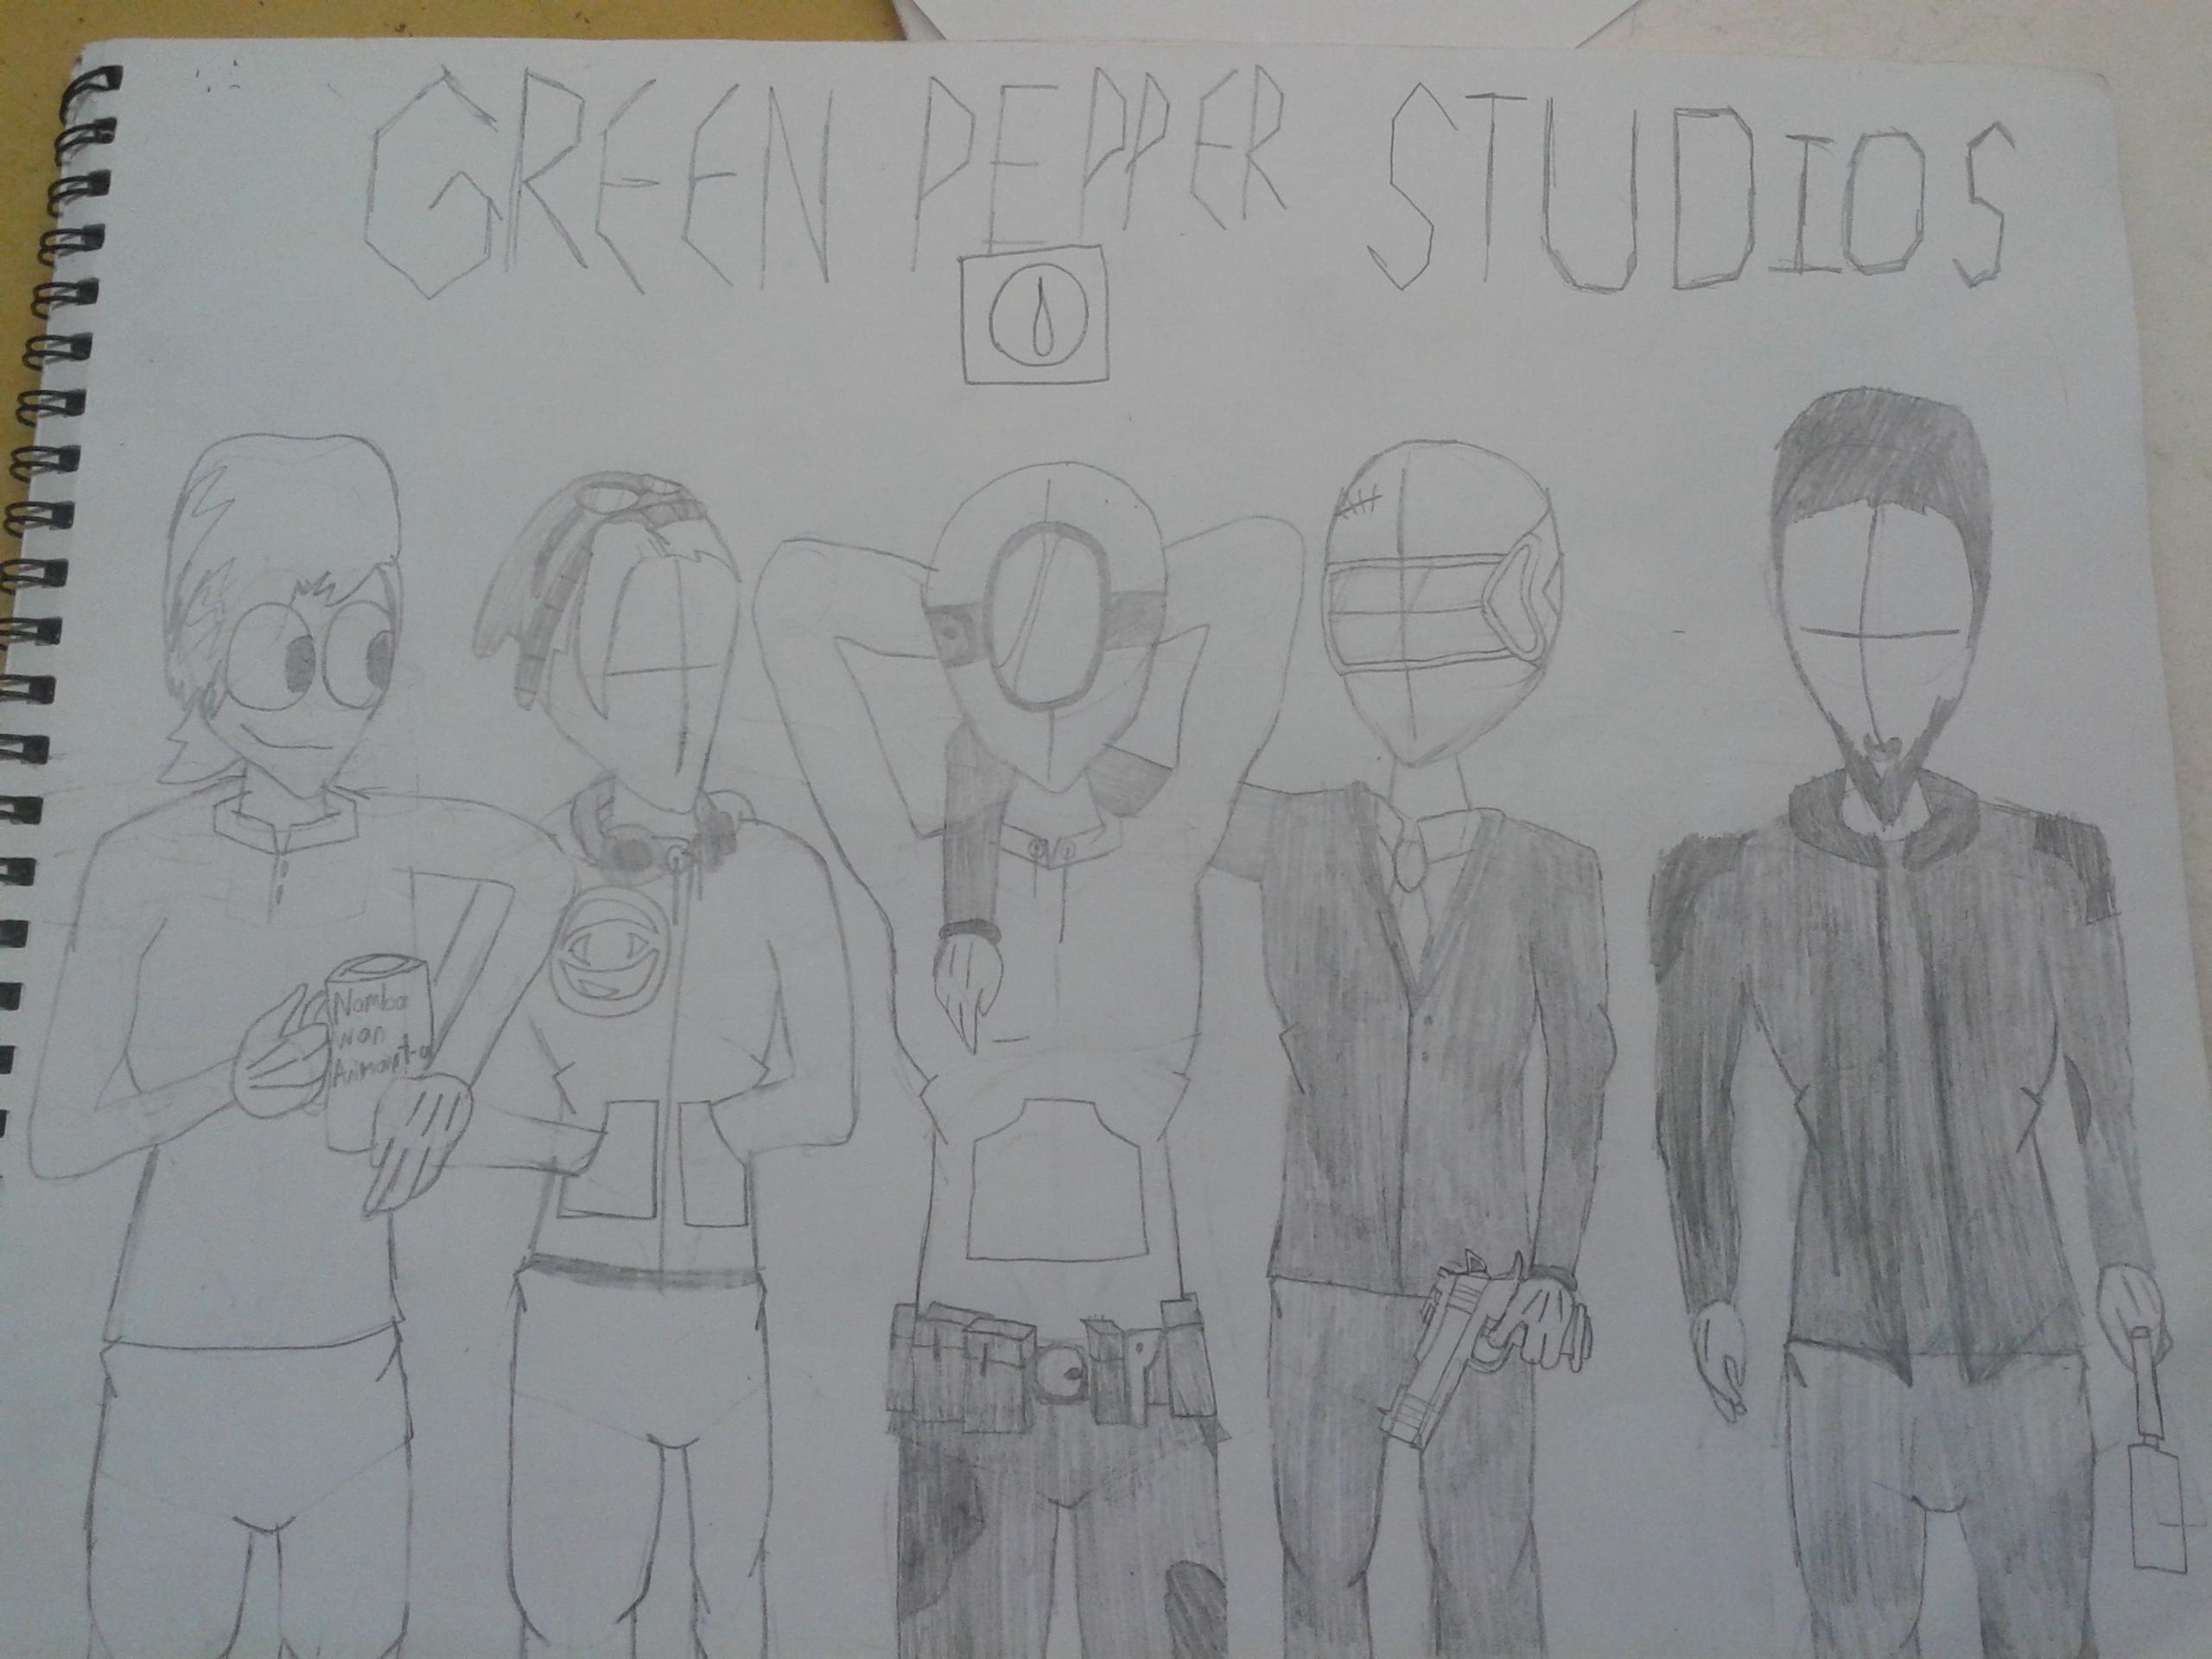 Green Pepper Studios